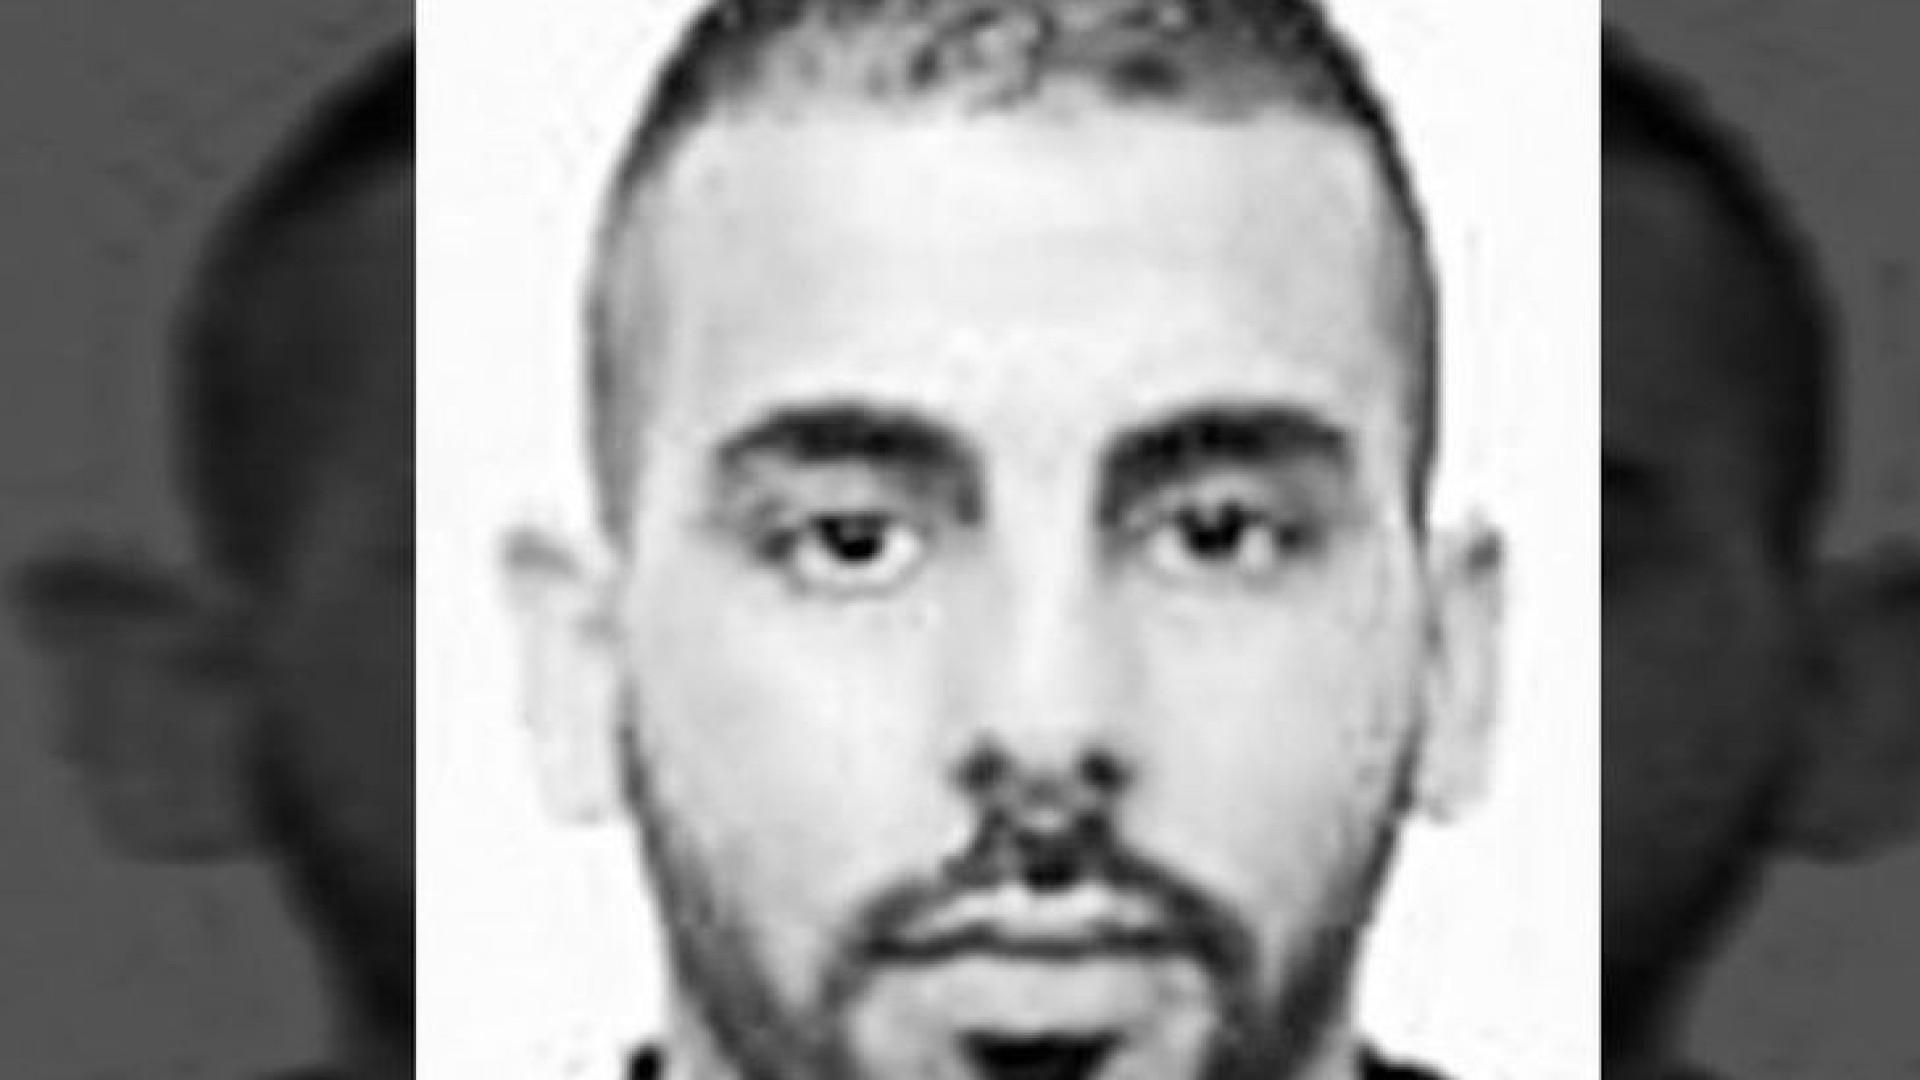 Identificado suspeito que atacou esquadra. Ato considerado terrorismo